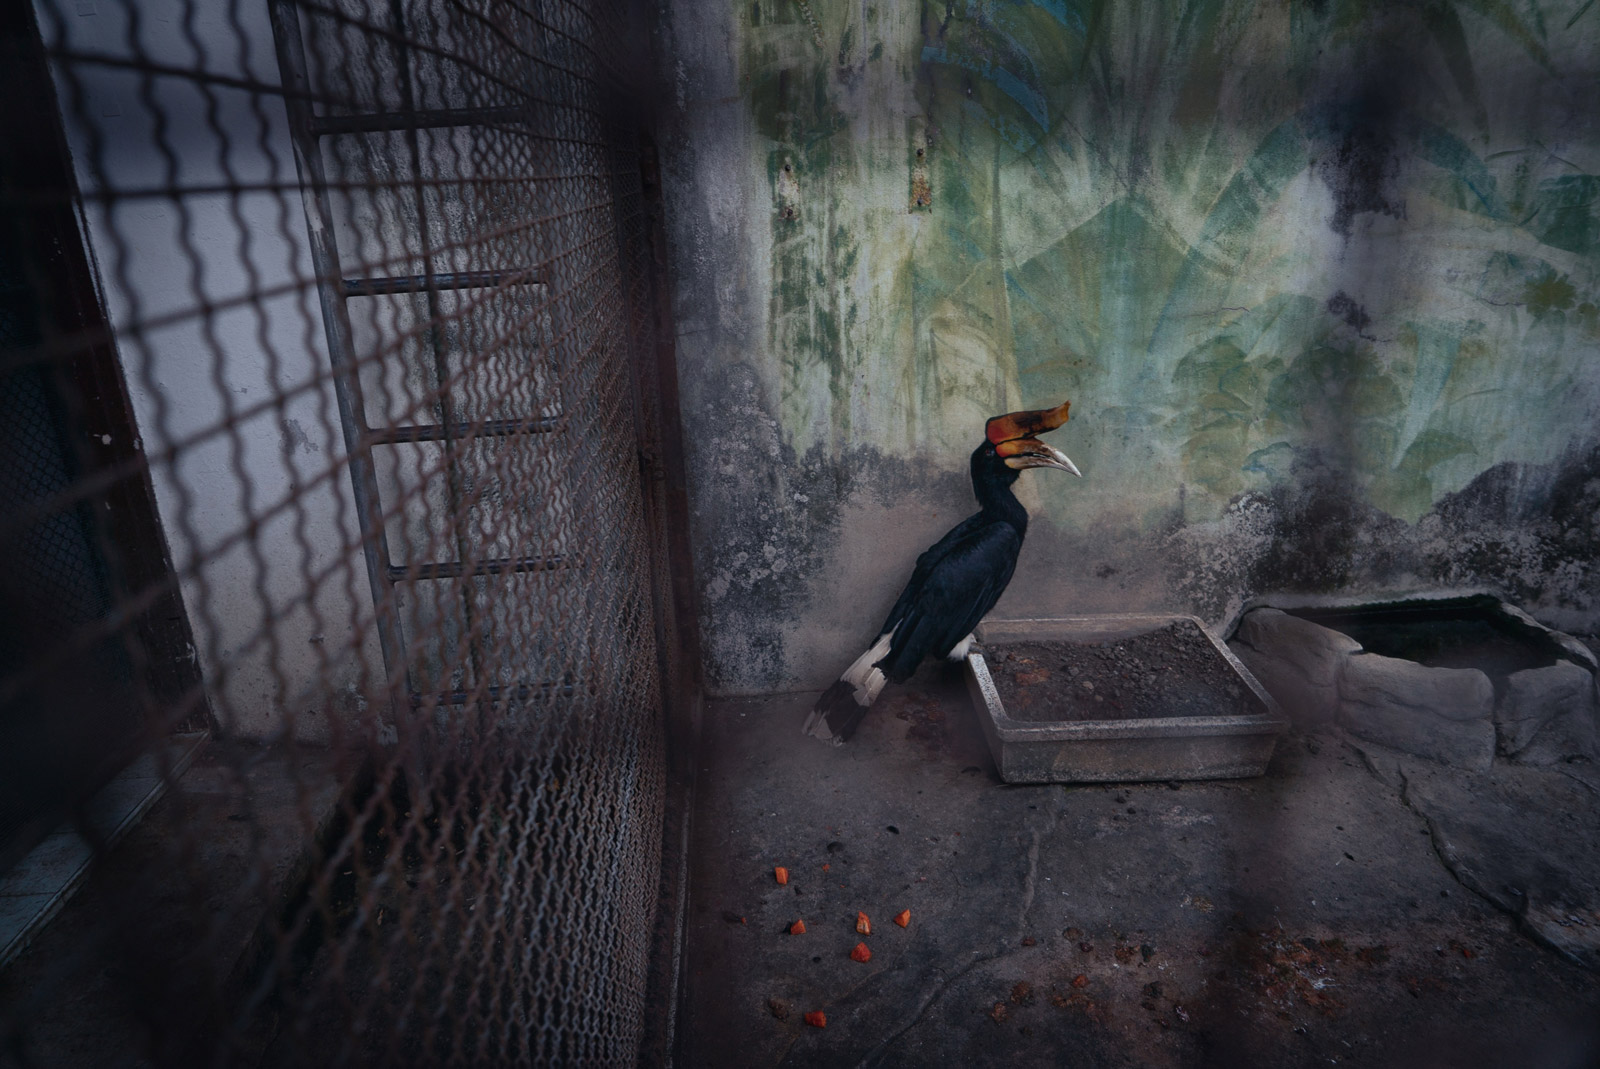 [Photos] Inside Pata, the 'World's Saddest Zoo' in Bangkok